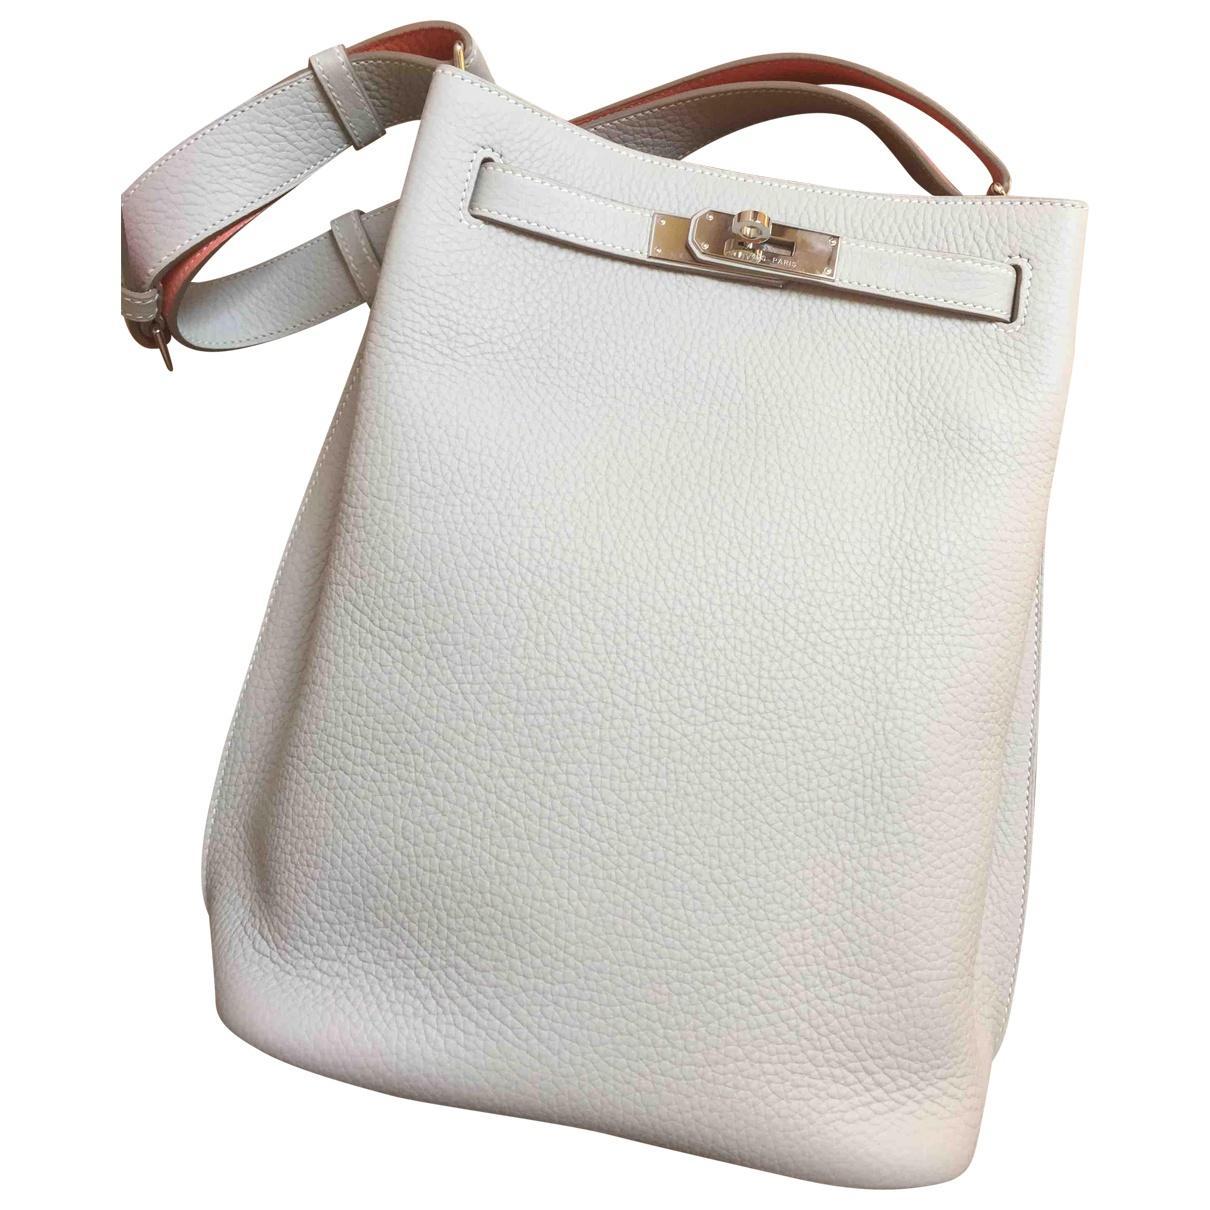 d417ae85704b Lyst - Hermès Pre-owned So Kelly Leather Handbag in White